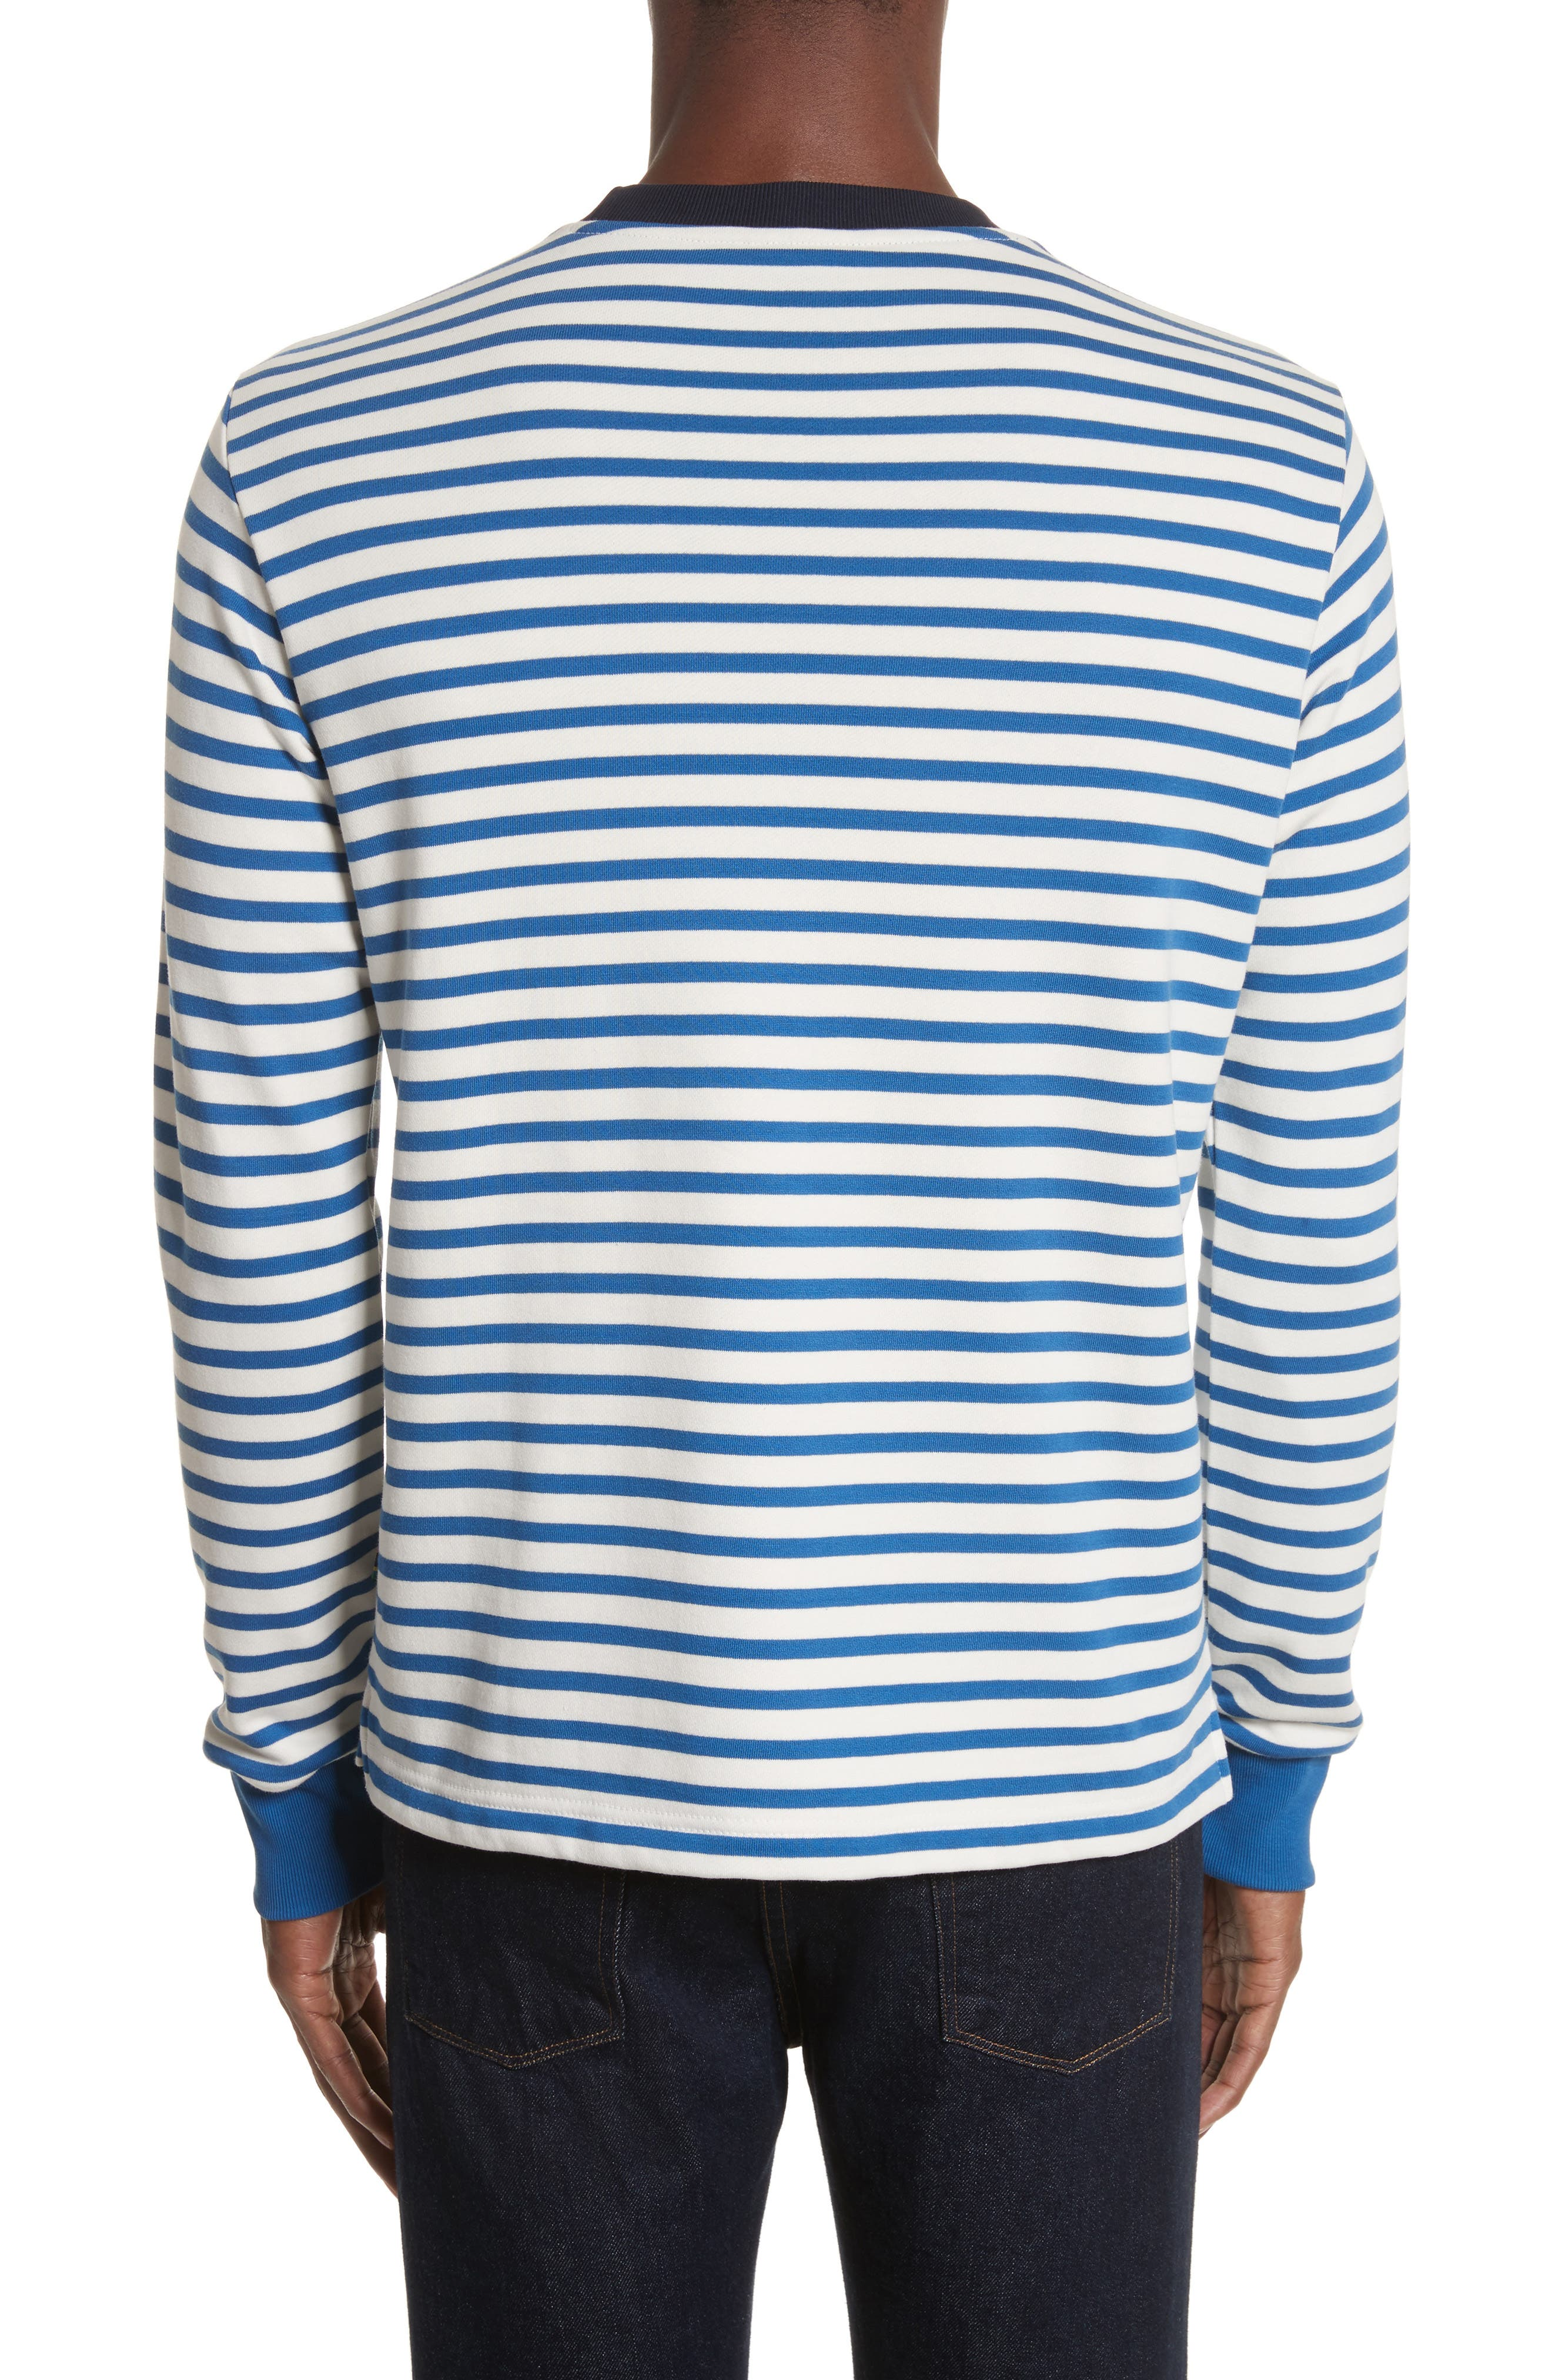 Stripe Crewneck Sweatshirt,                             Alternate thumbnail 2, color,                             434